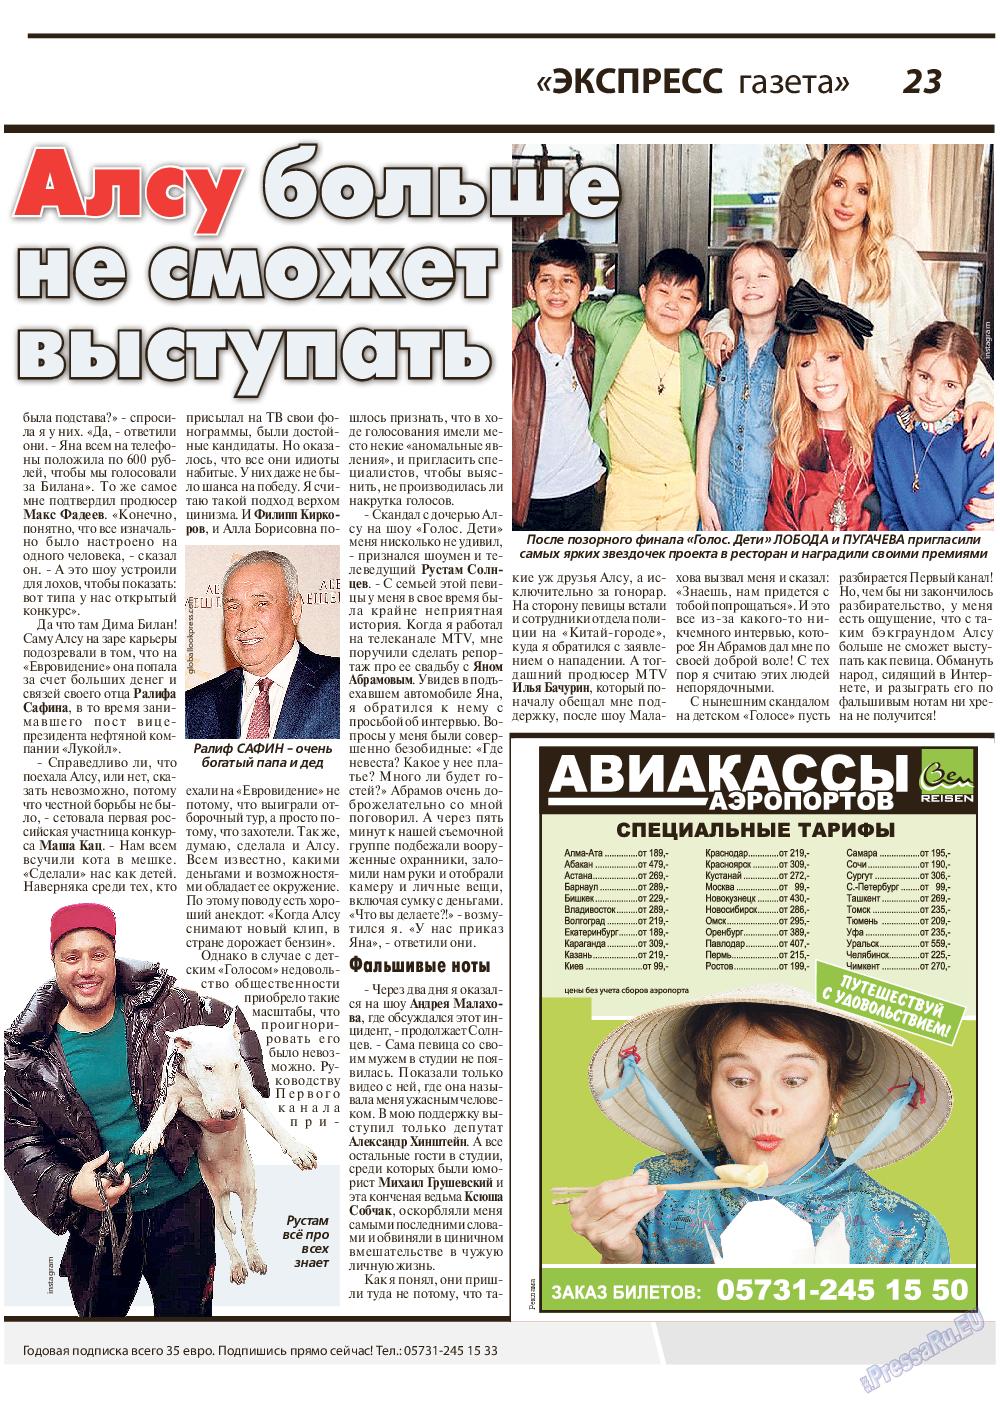 Экспресс газета (газета). 2019 год, номер 6, стр. 23